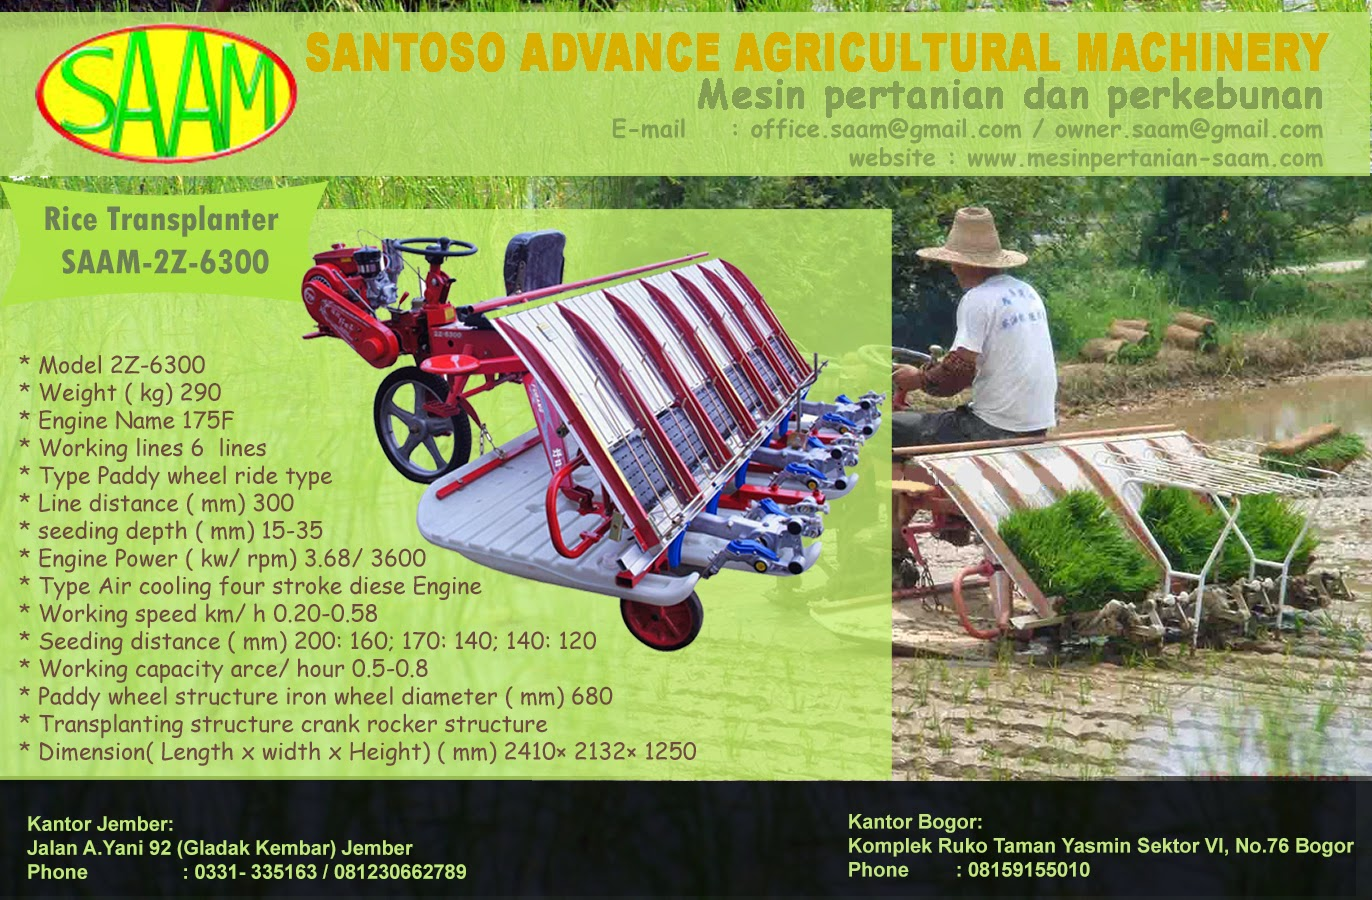 Mesin Tanam Padi Rice Transplanter Saam 2z 6300 Santoso Advance Paket Tudung 1 Pisau Dan Gearcase Transplanting Structure Crank Rocker